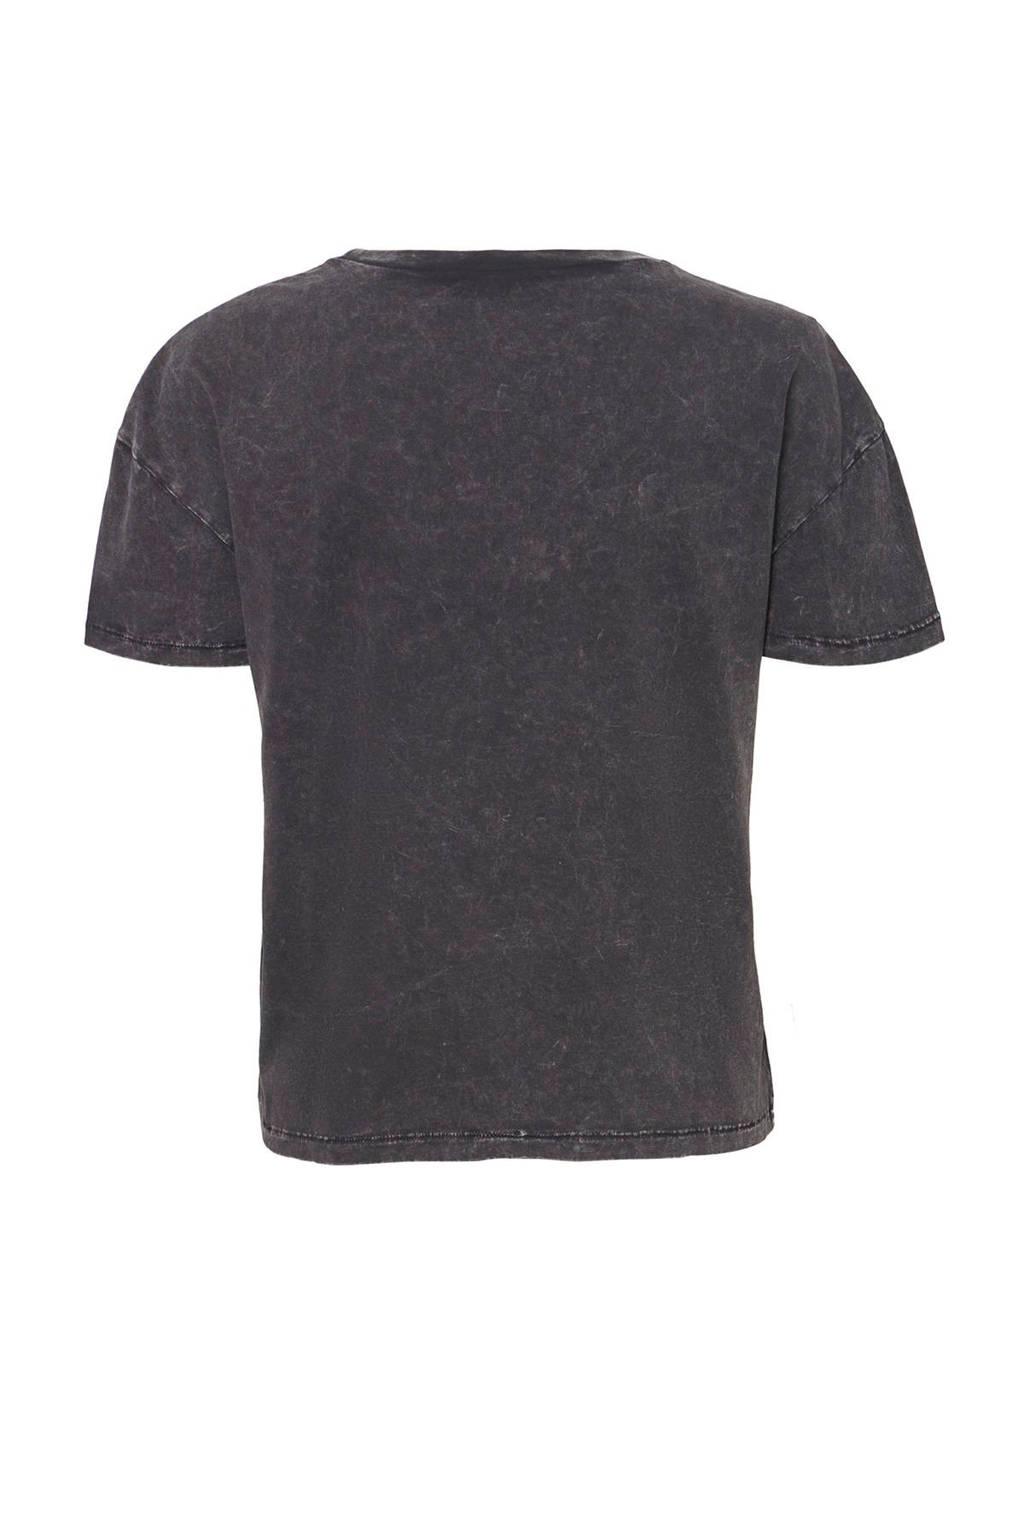 Mayt Noisy Met Noisy Printopdruk Met Mayt shirt Printopdruk shirt wqARtXaI